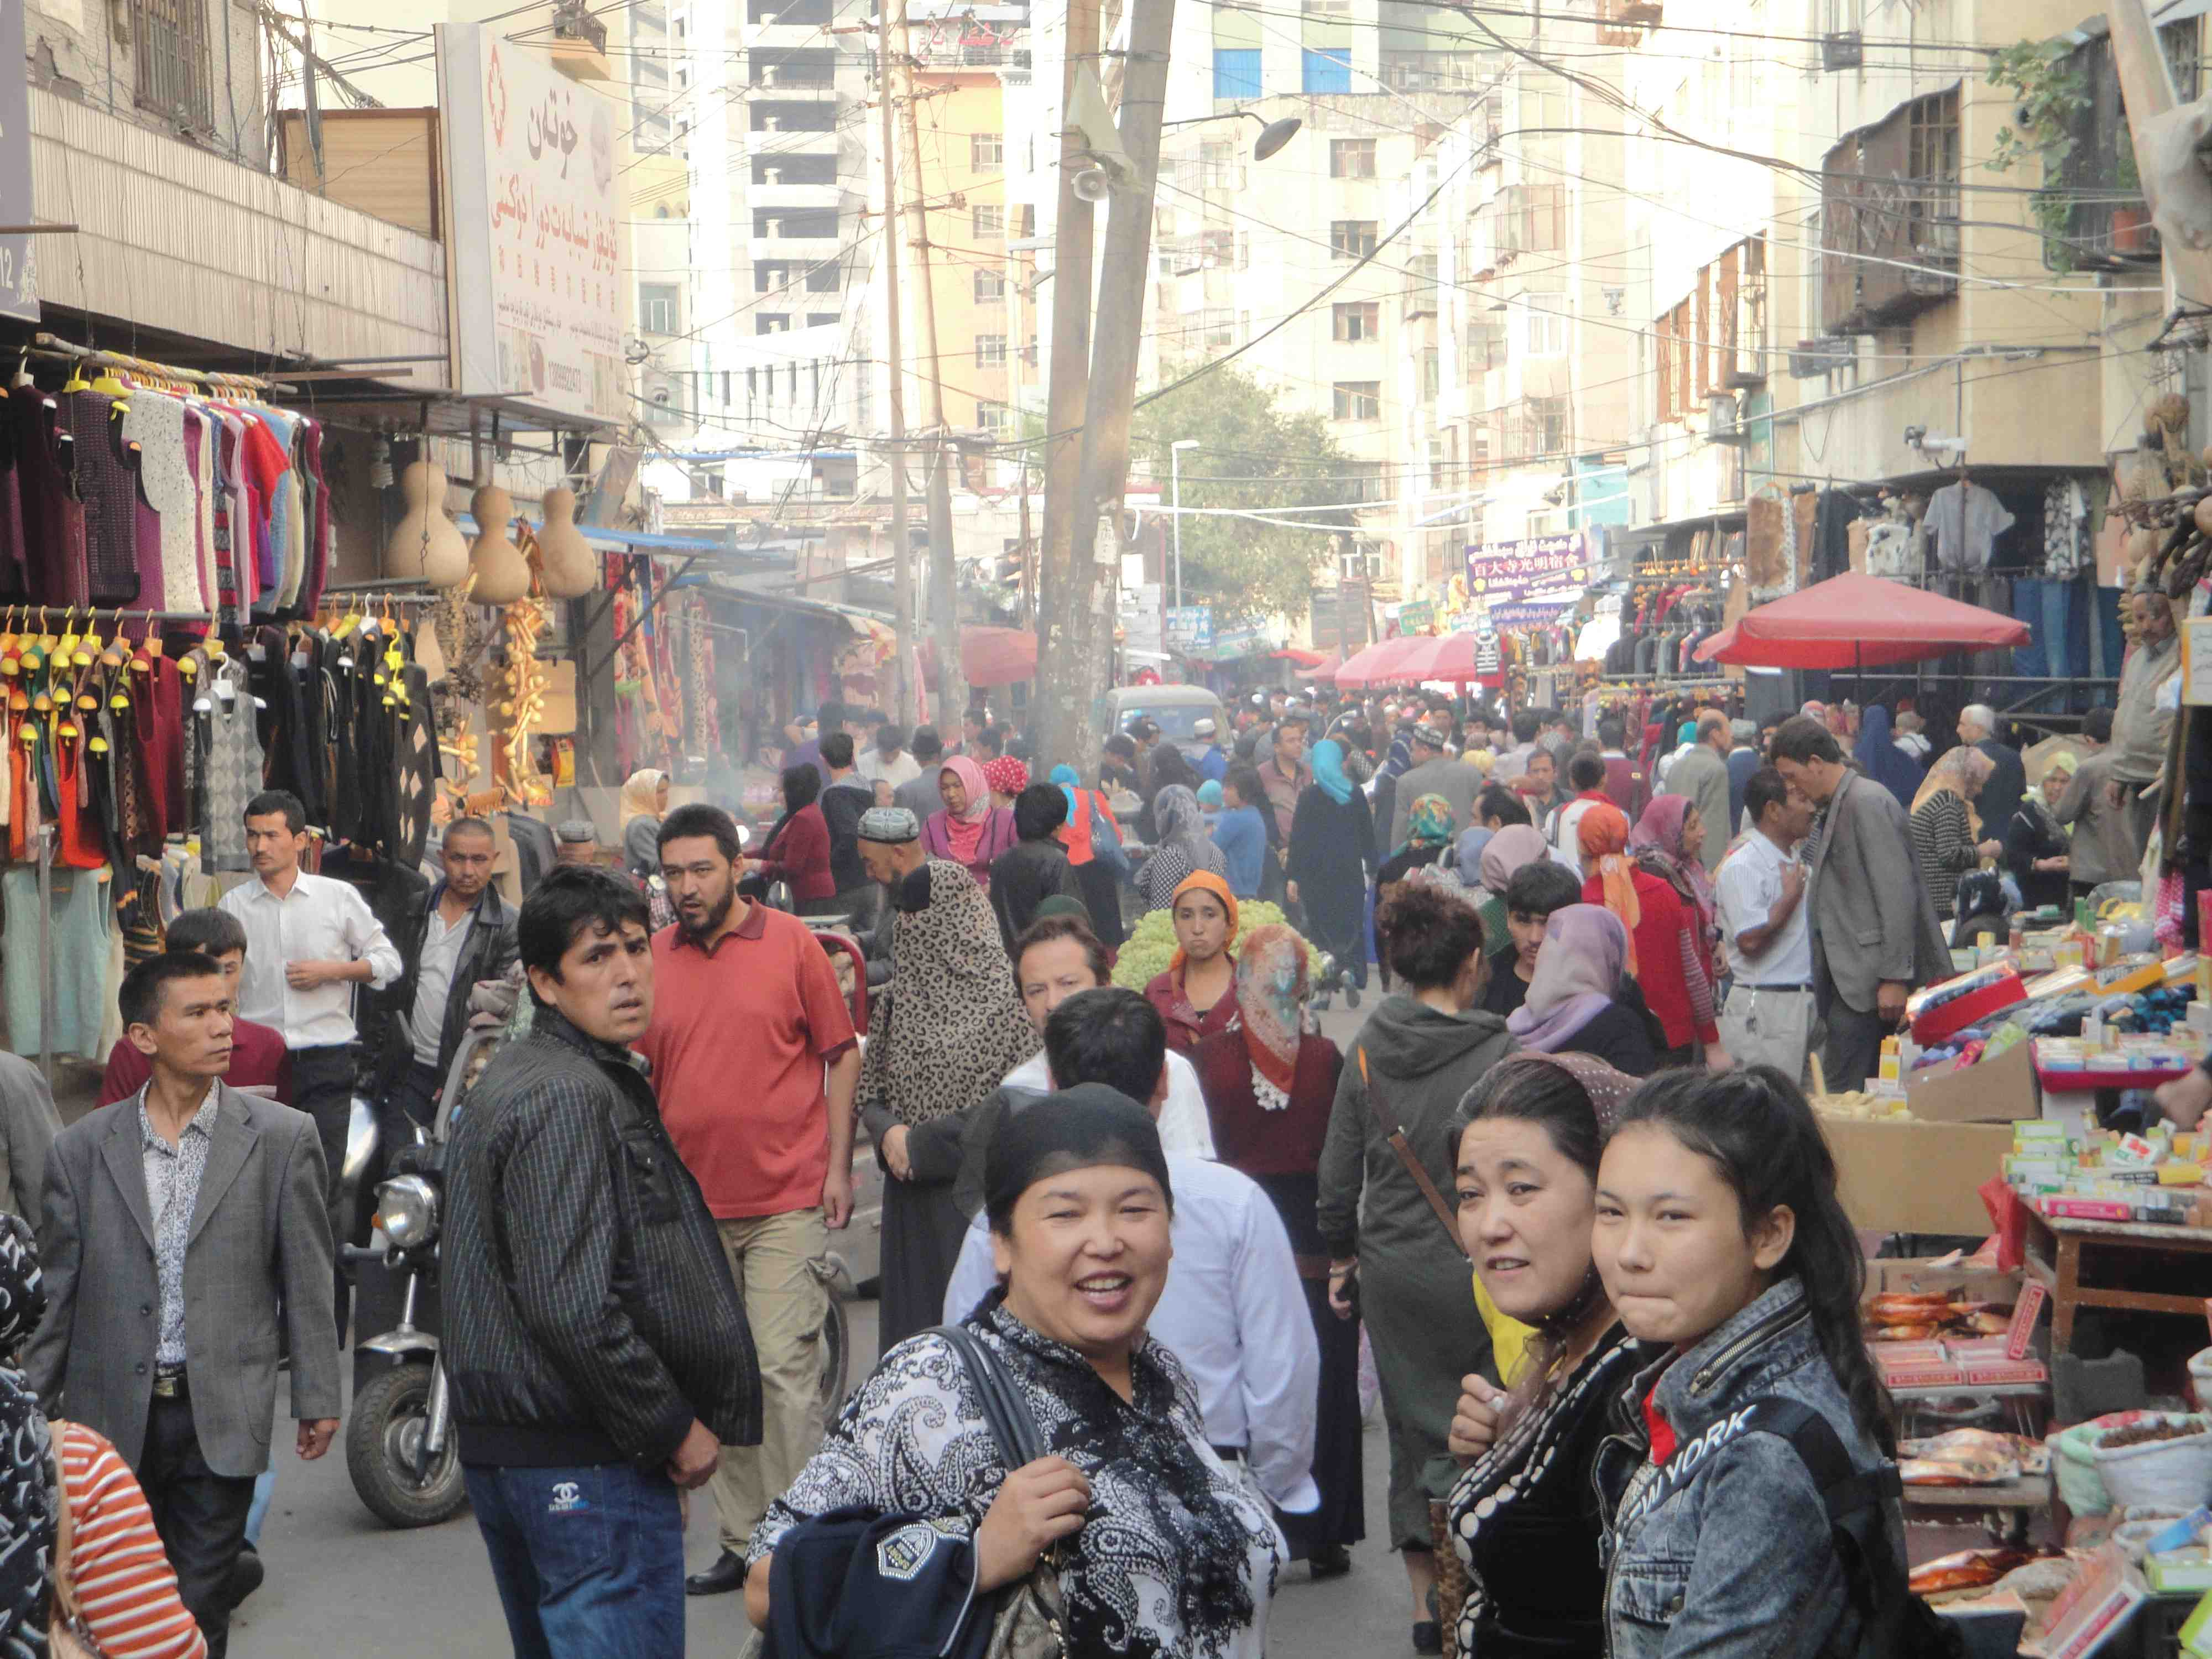 Back street in Urumqi, September 2013